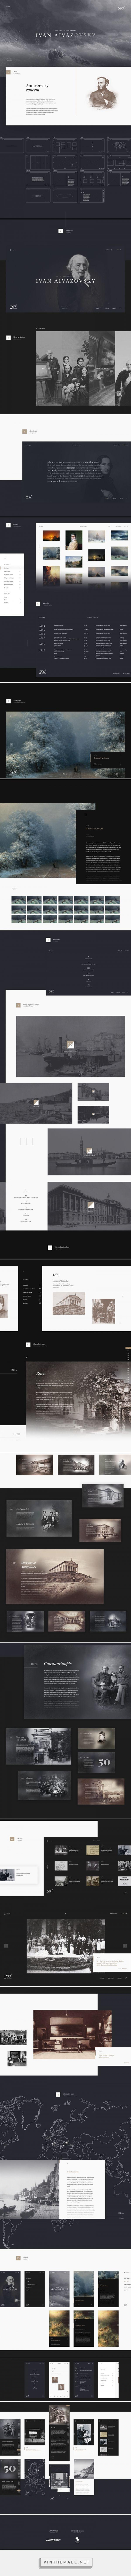 Ivan Aivazovsky   Anniversary concept on Behance - created via https://pinthemall.net